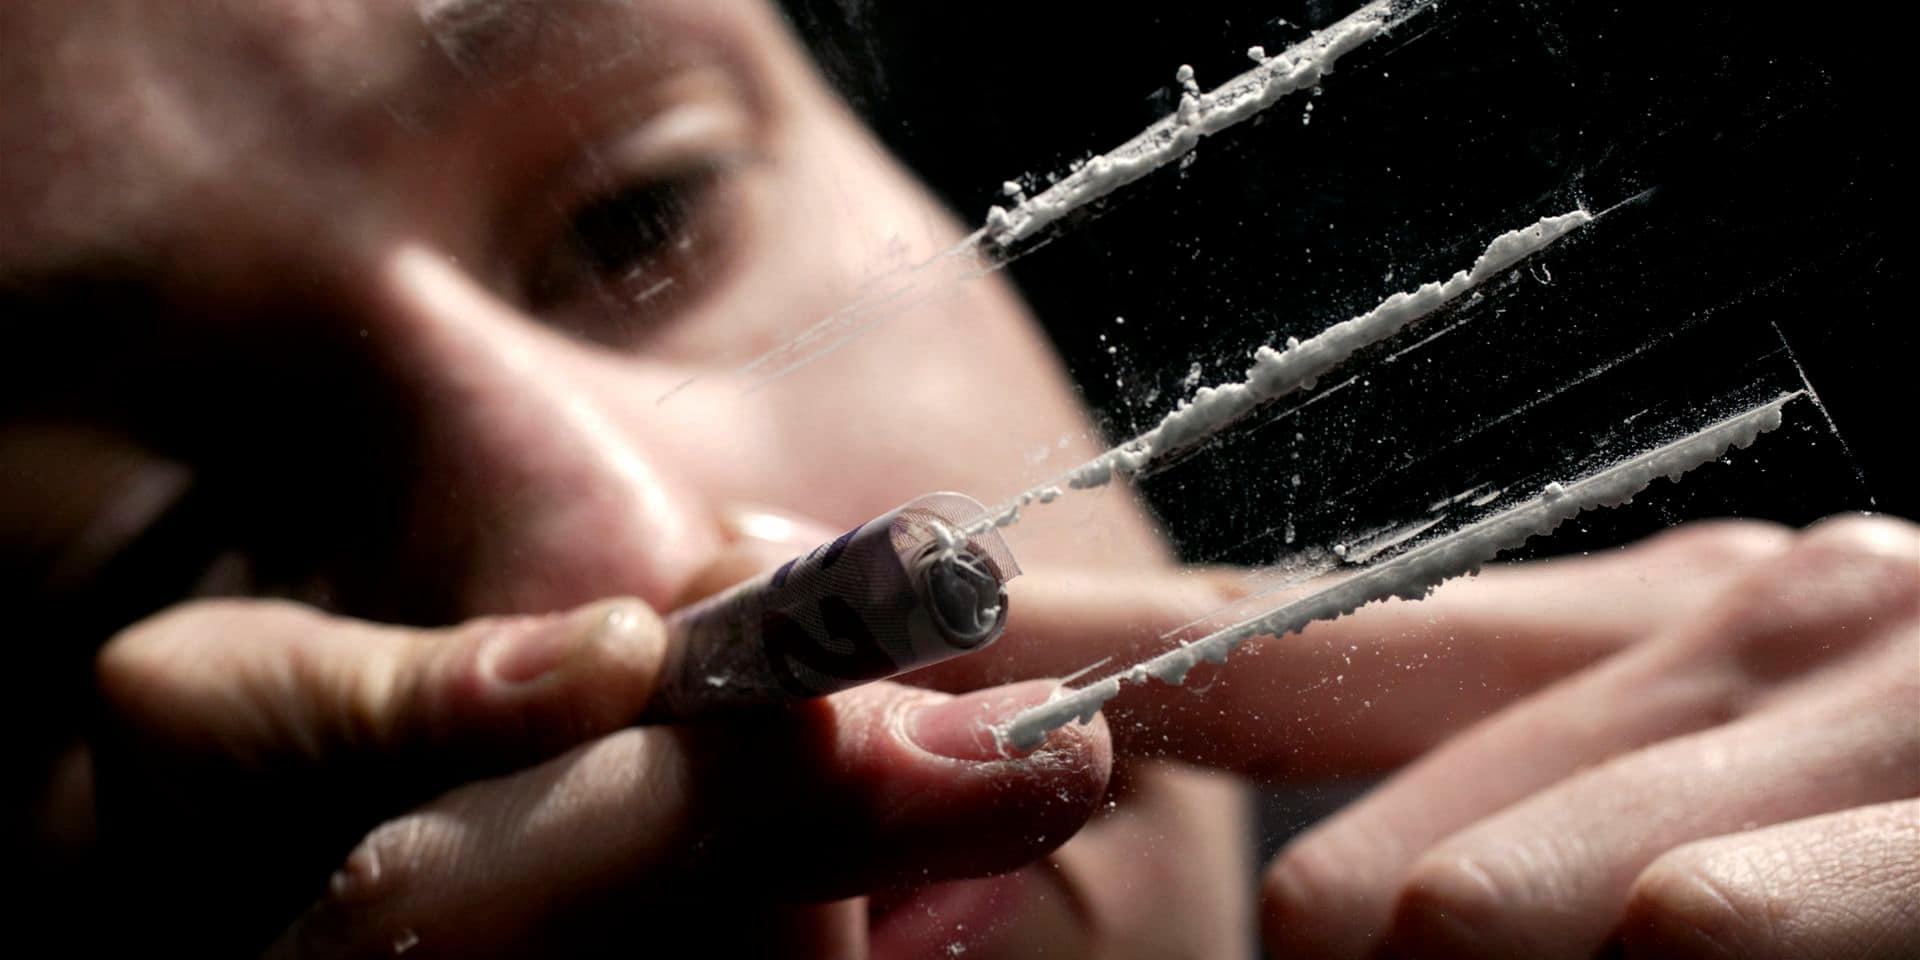 Drogues, médocs, désintox… un handicap à vie (TEMOIGNAGE)